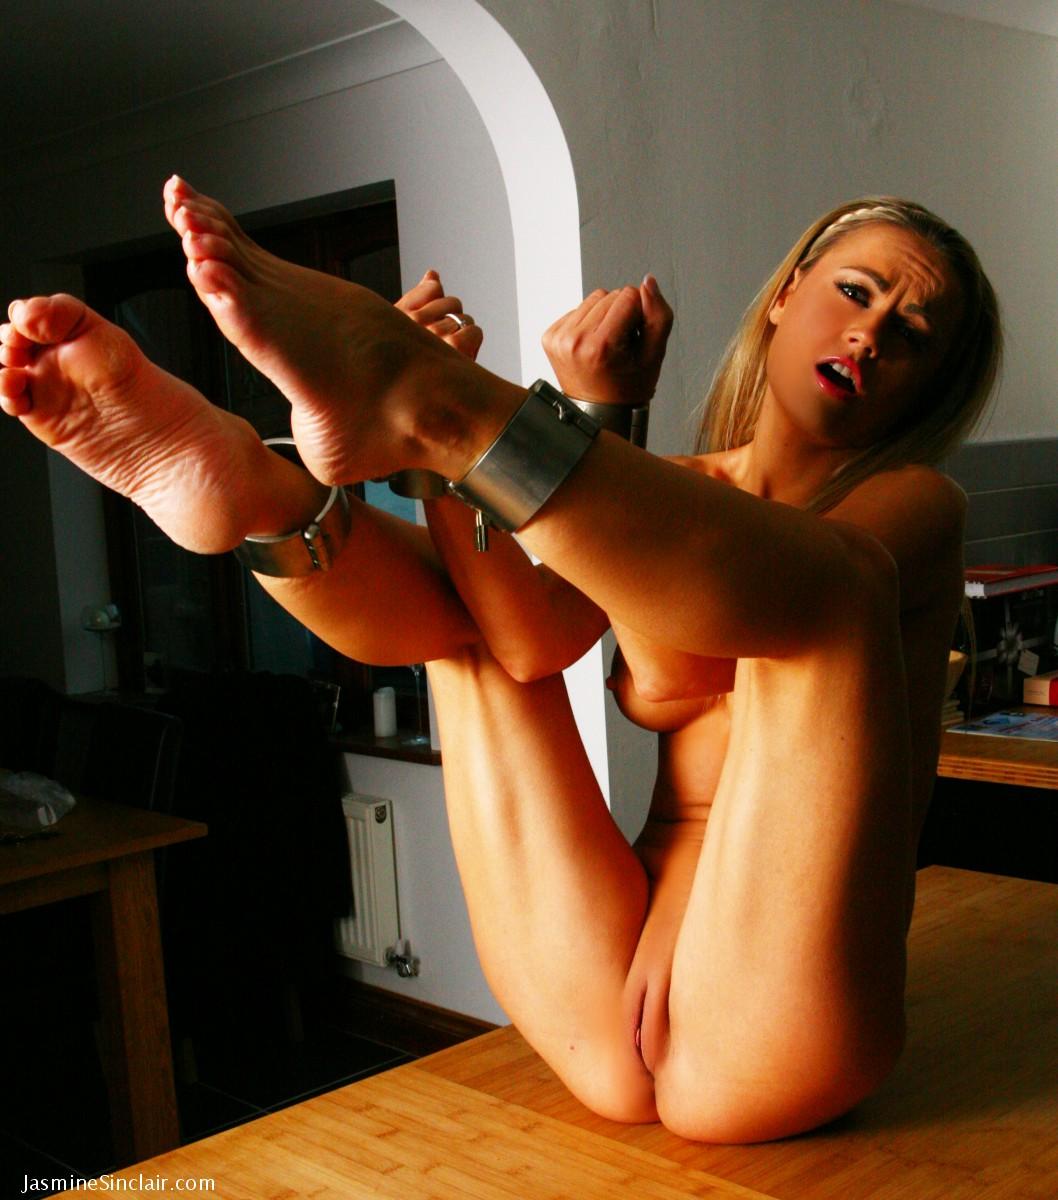 Gal gadot nude deepfake porn ww foot fetish